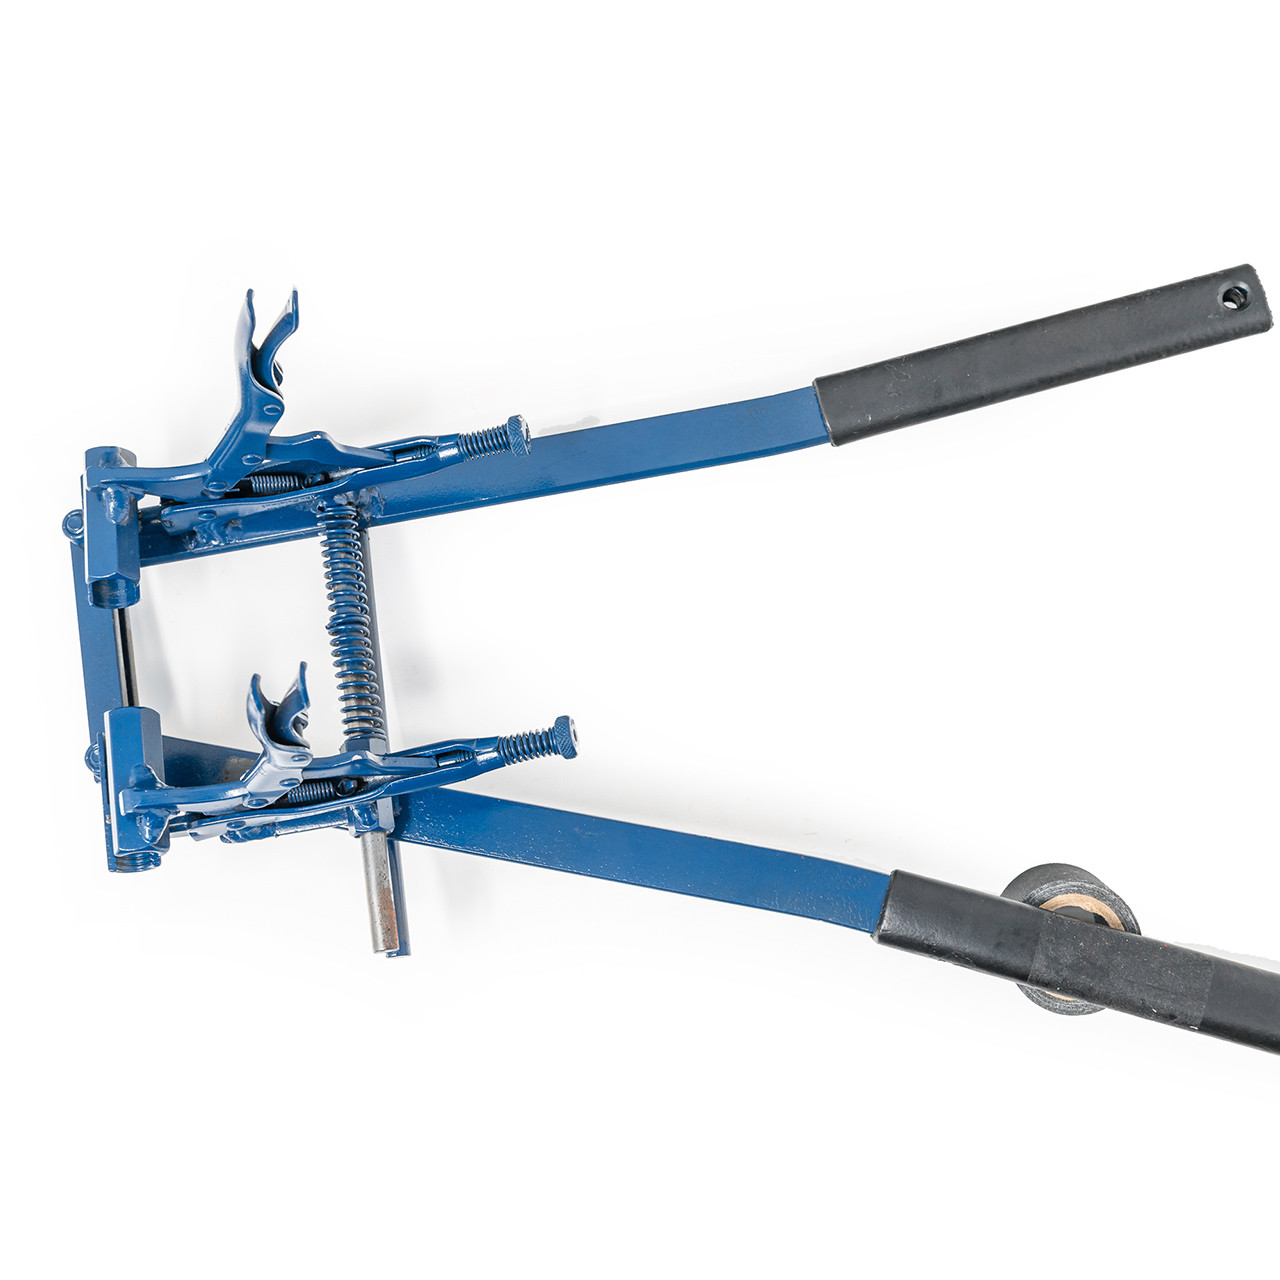 "Multi-Function 5/16"" Tubing Tool"